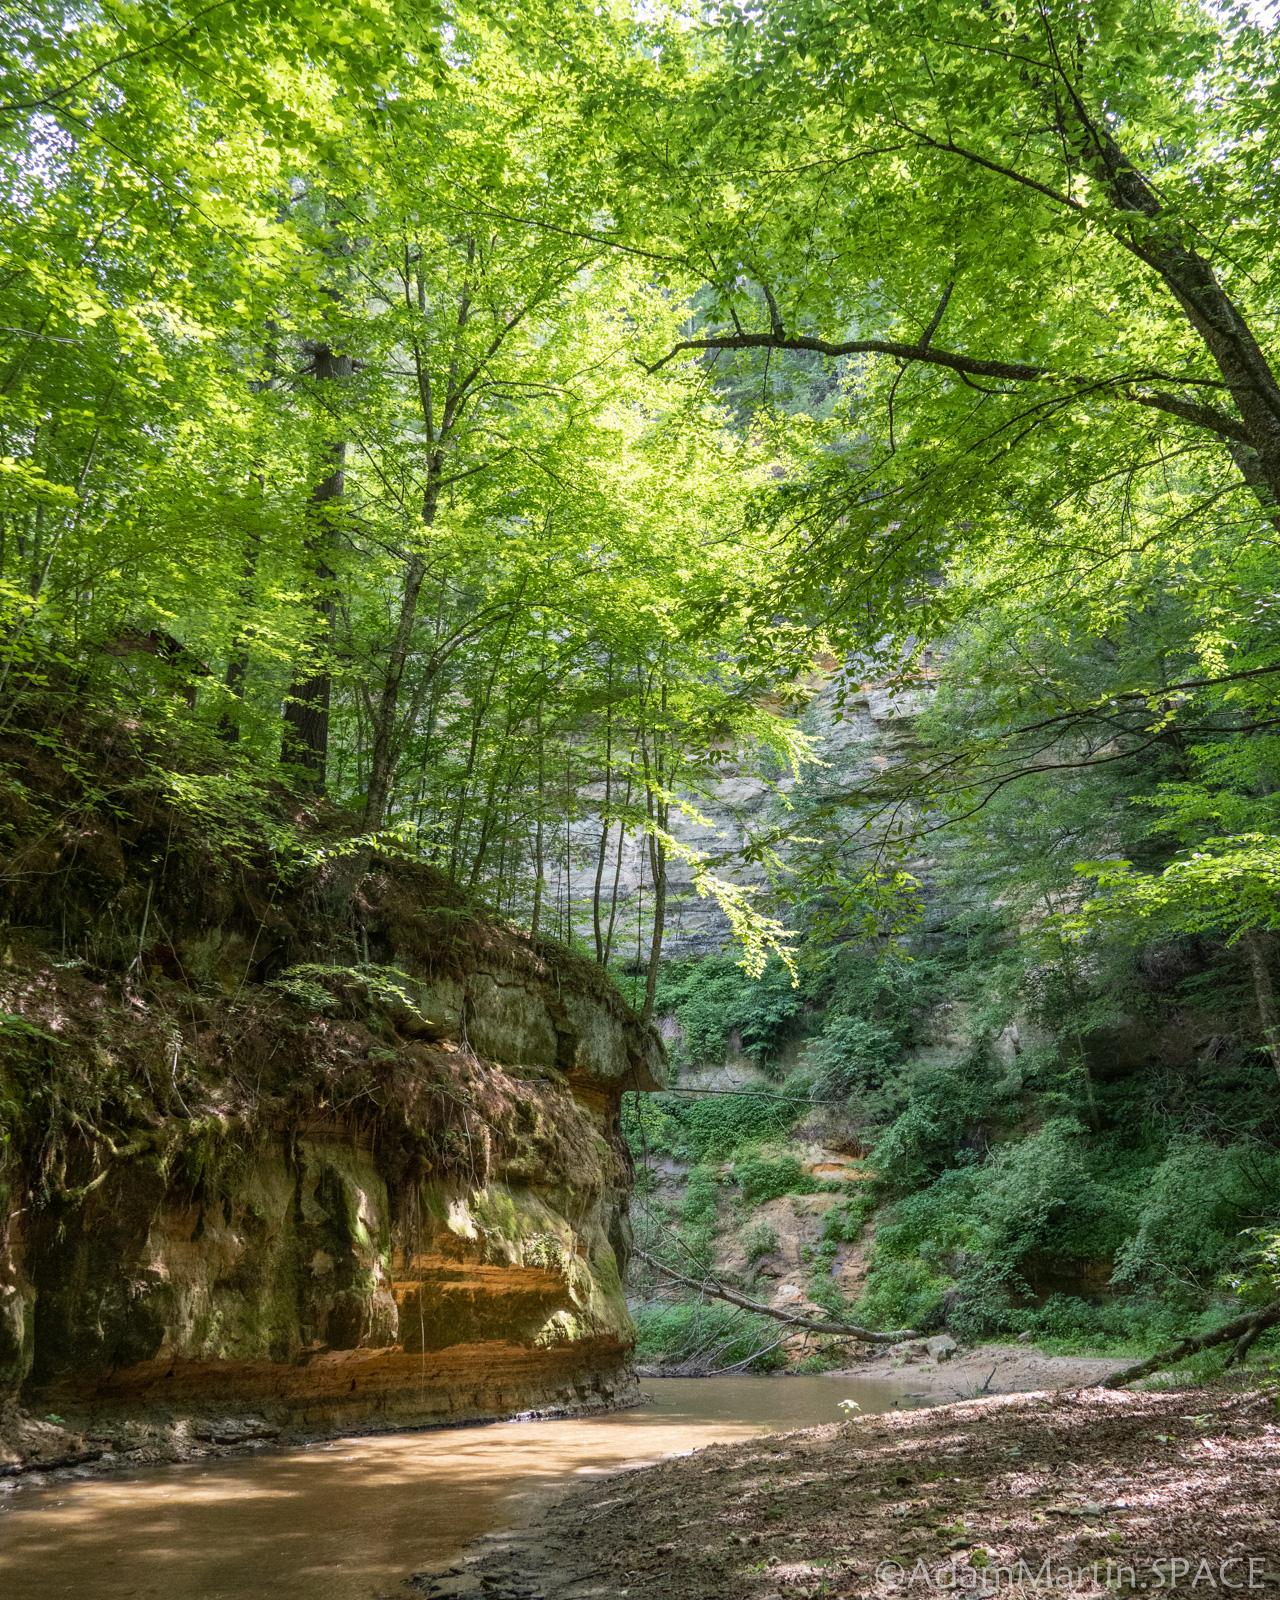 Hiking down Roaring Creek in Black River Falls, Wisconsin